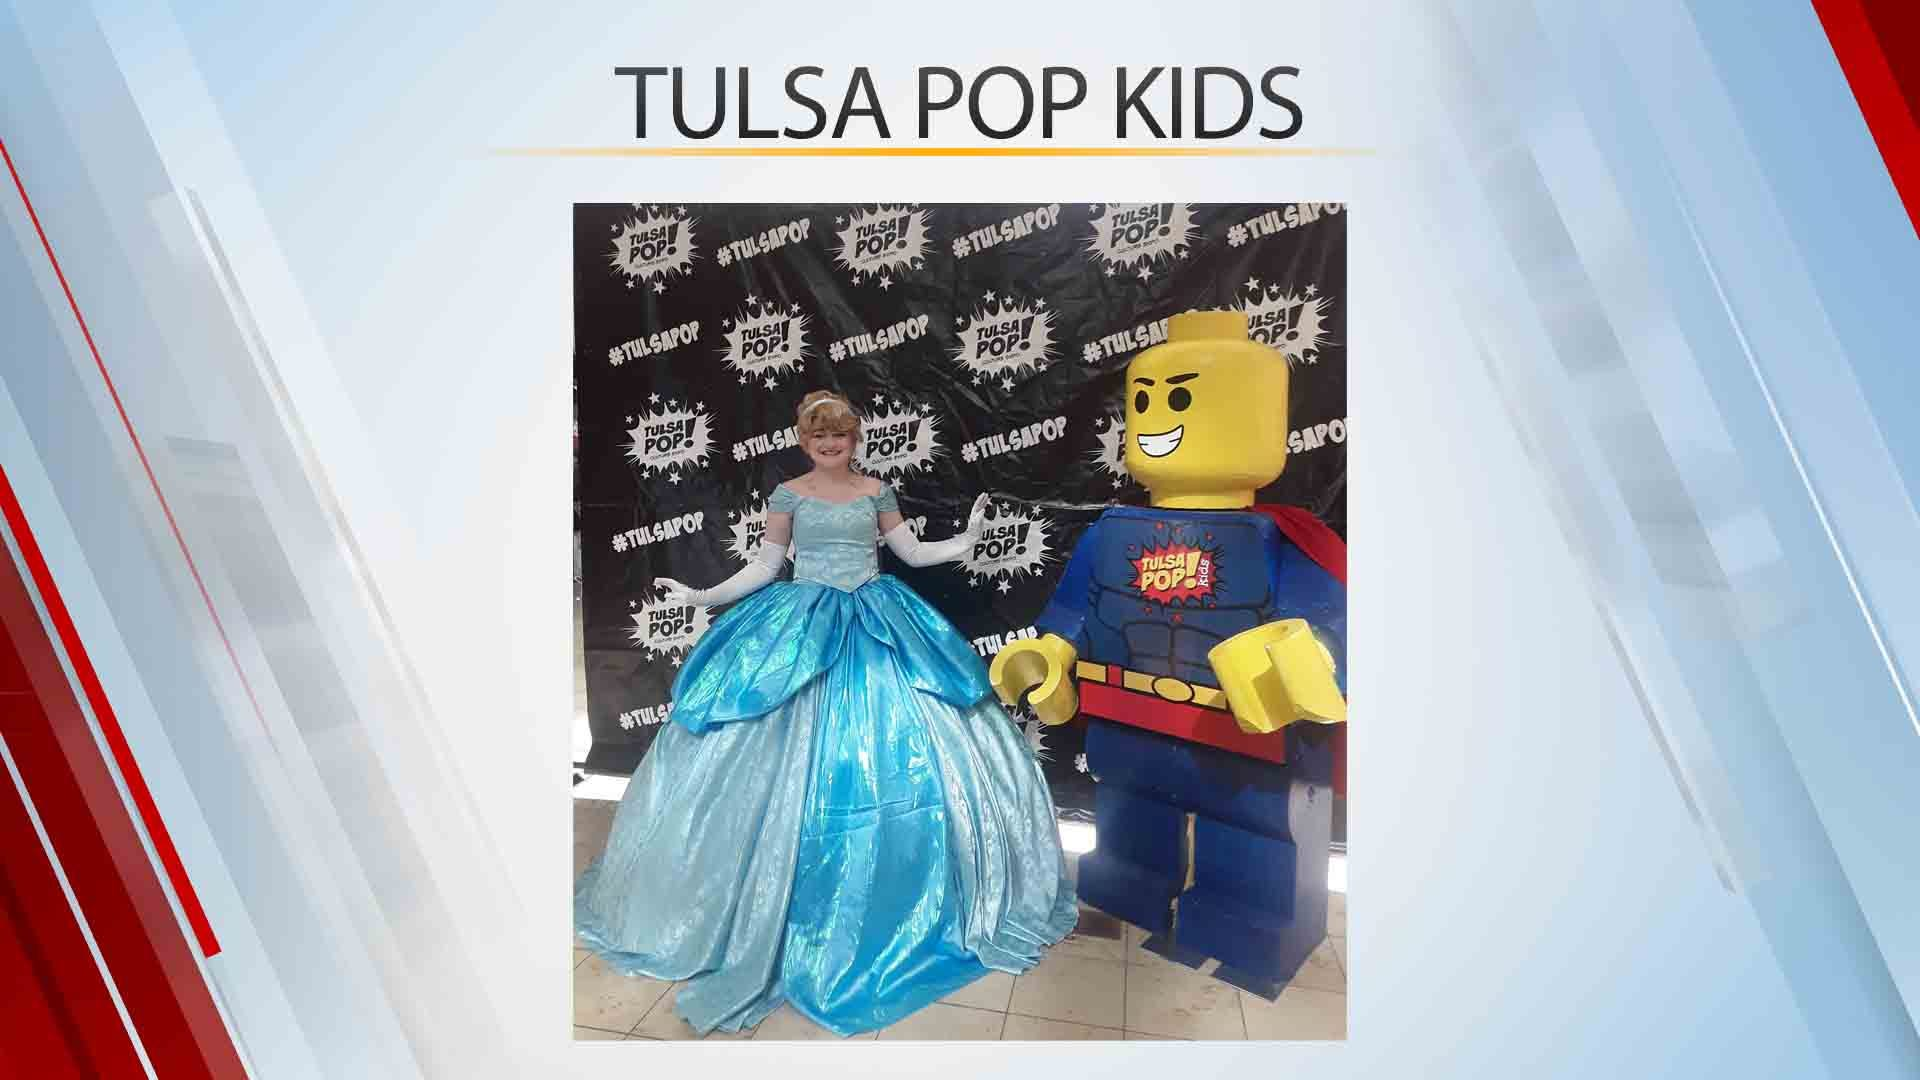 Tulsa Pop Kids Announces Pop Culture Expo